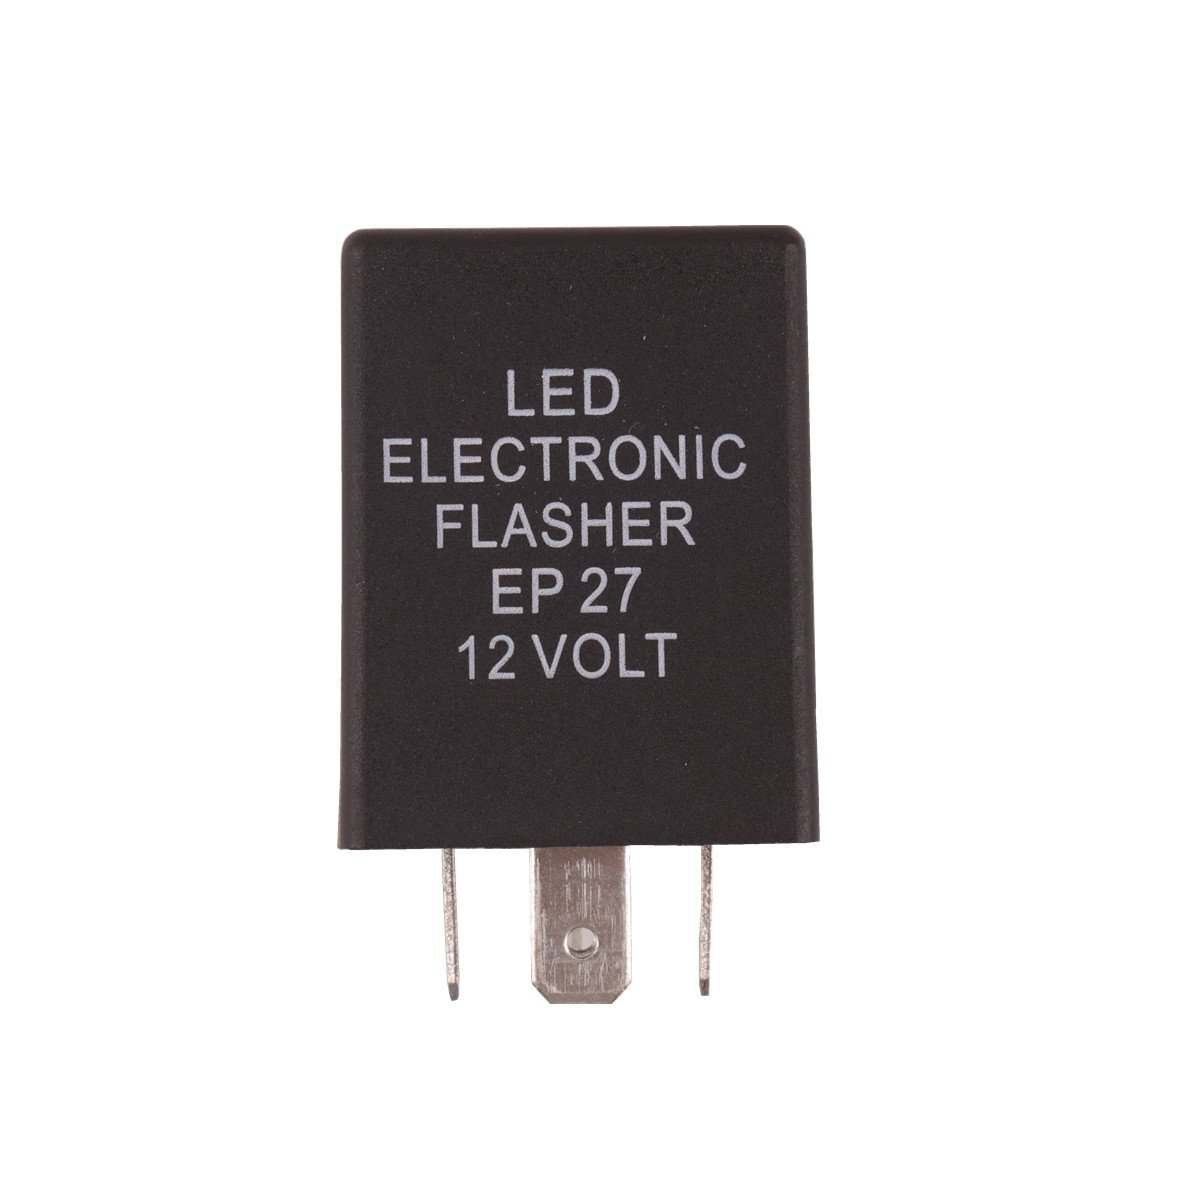 5-Pin EP27 FL27 Electronic LED Bulb Flasher Relay KF-10106